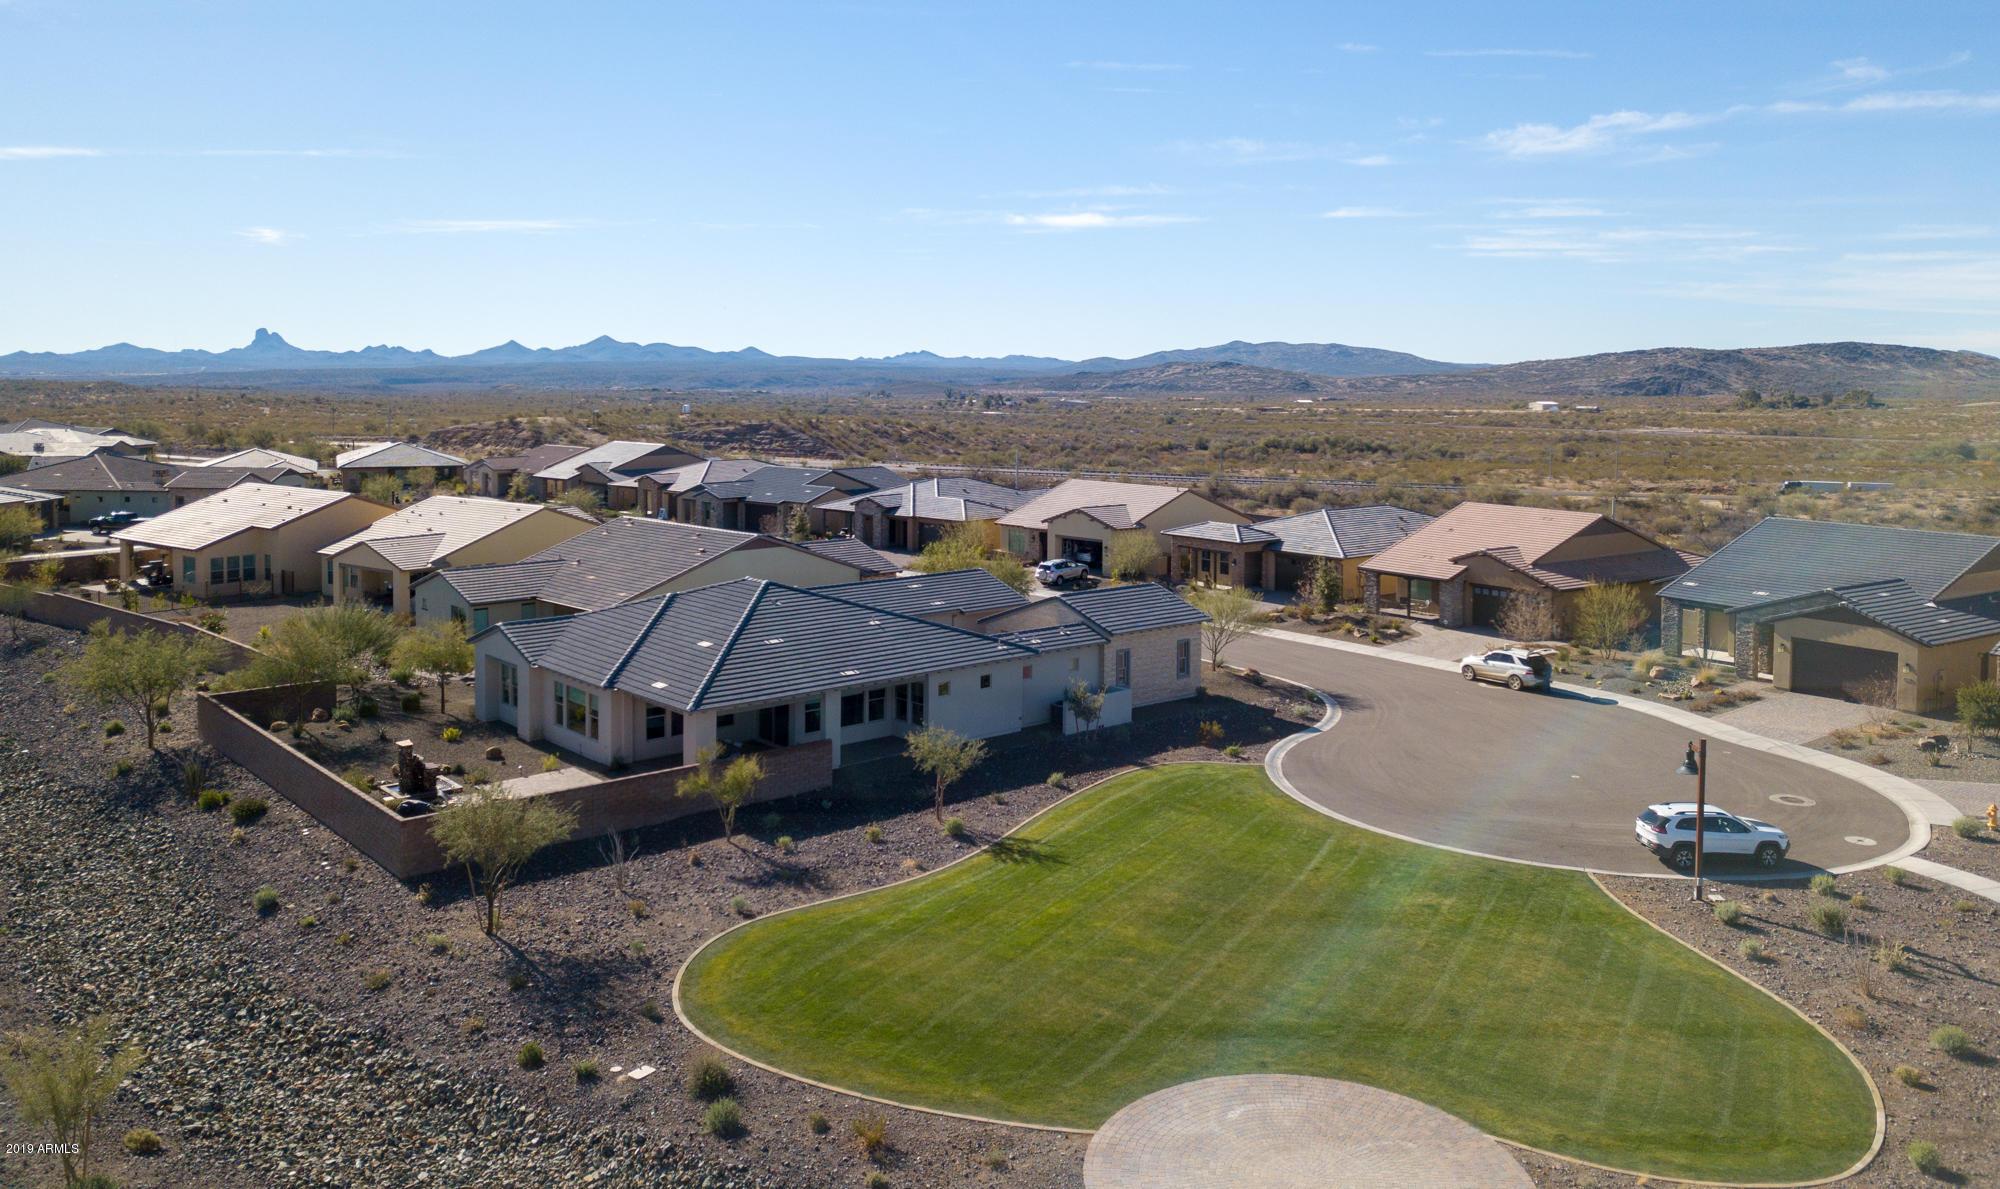 3761 Gold Rush Court, Wickenburg, AZ 85390, MLS # 5868492 | Better Homes  and Gardens BloomTree Realty